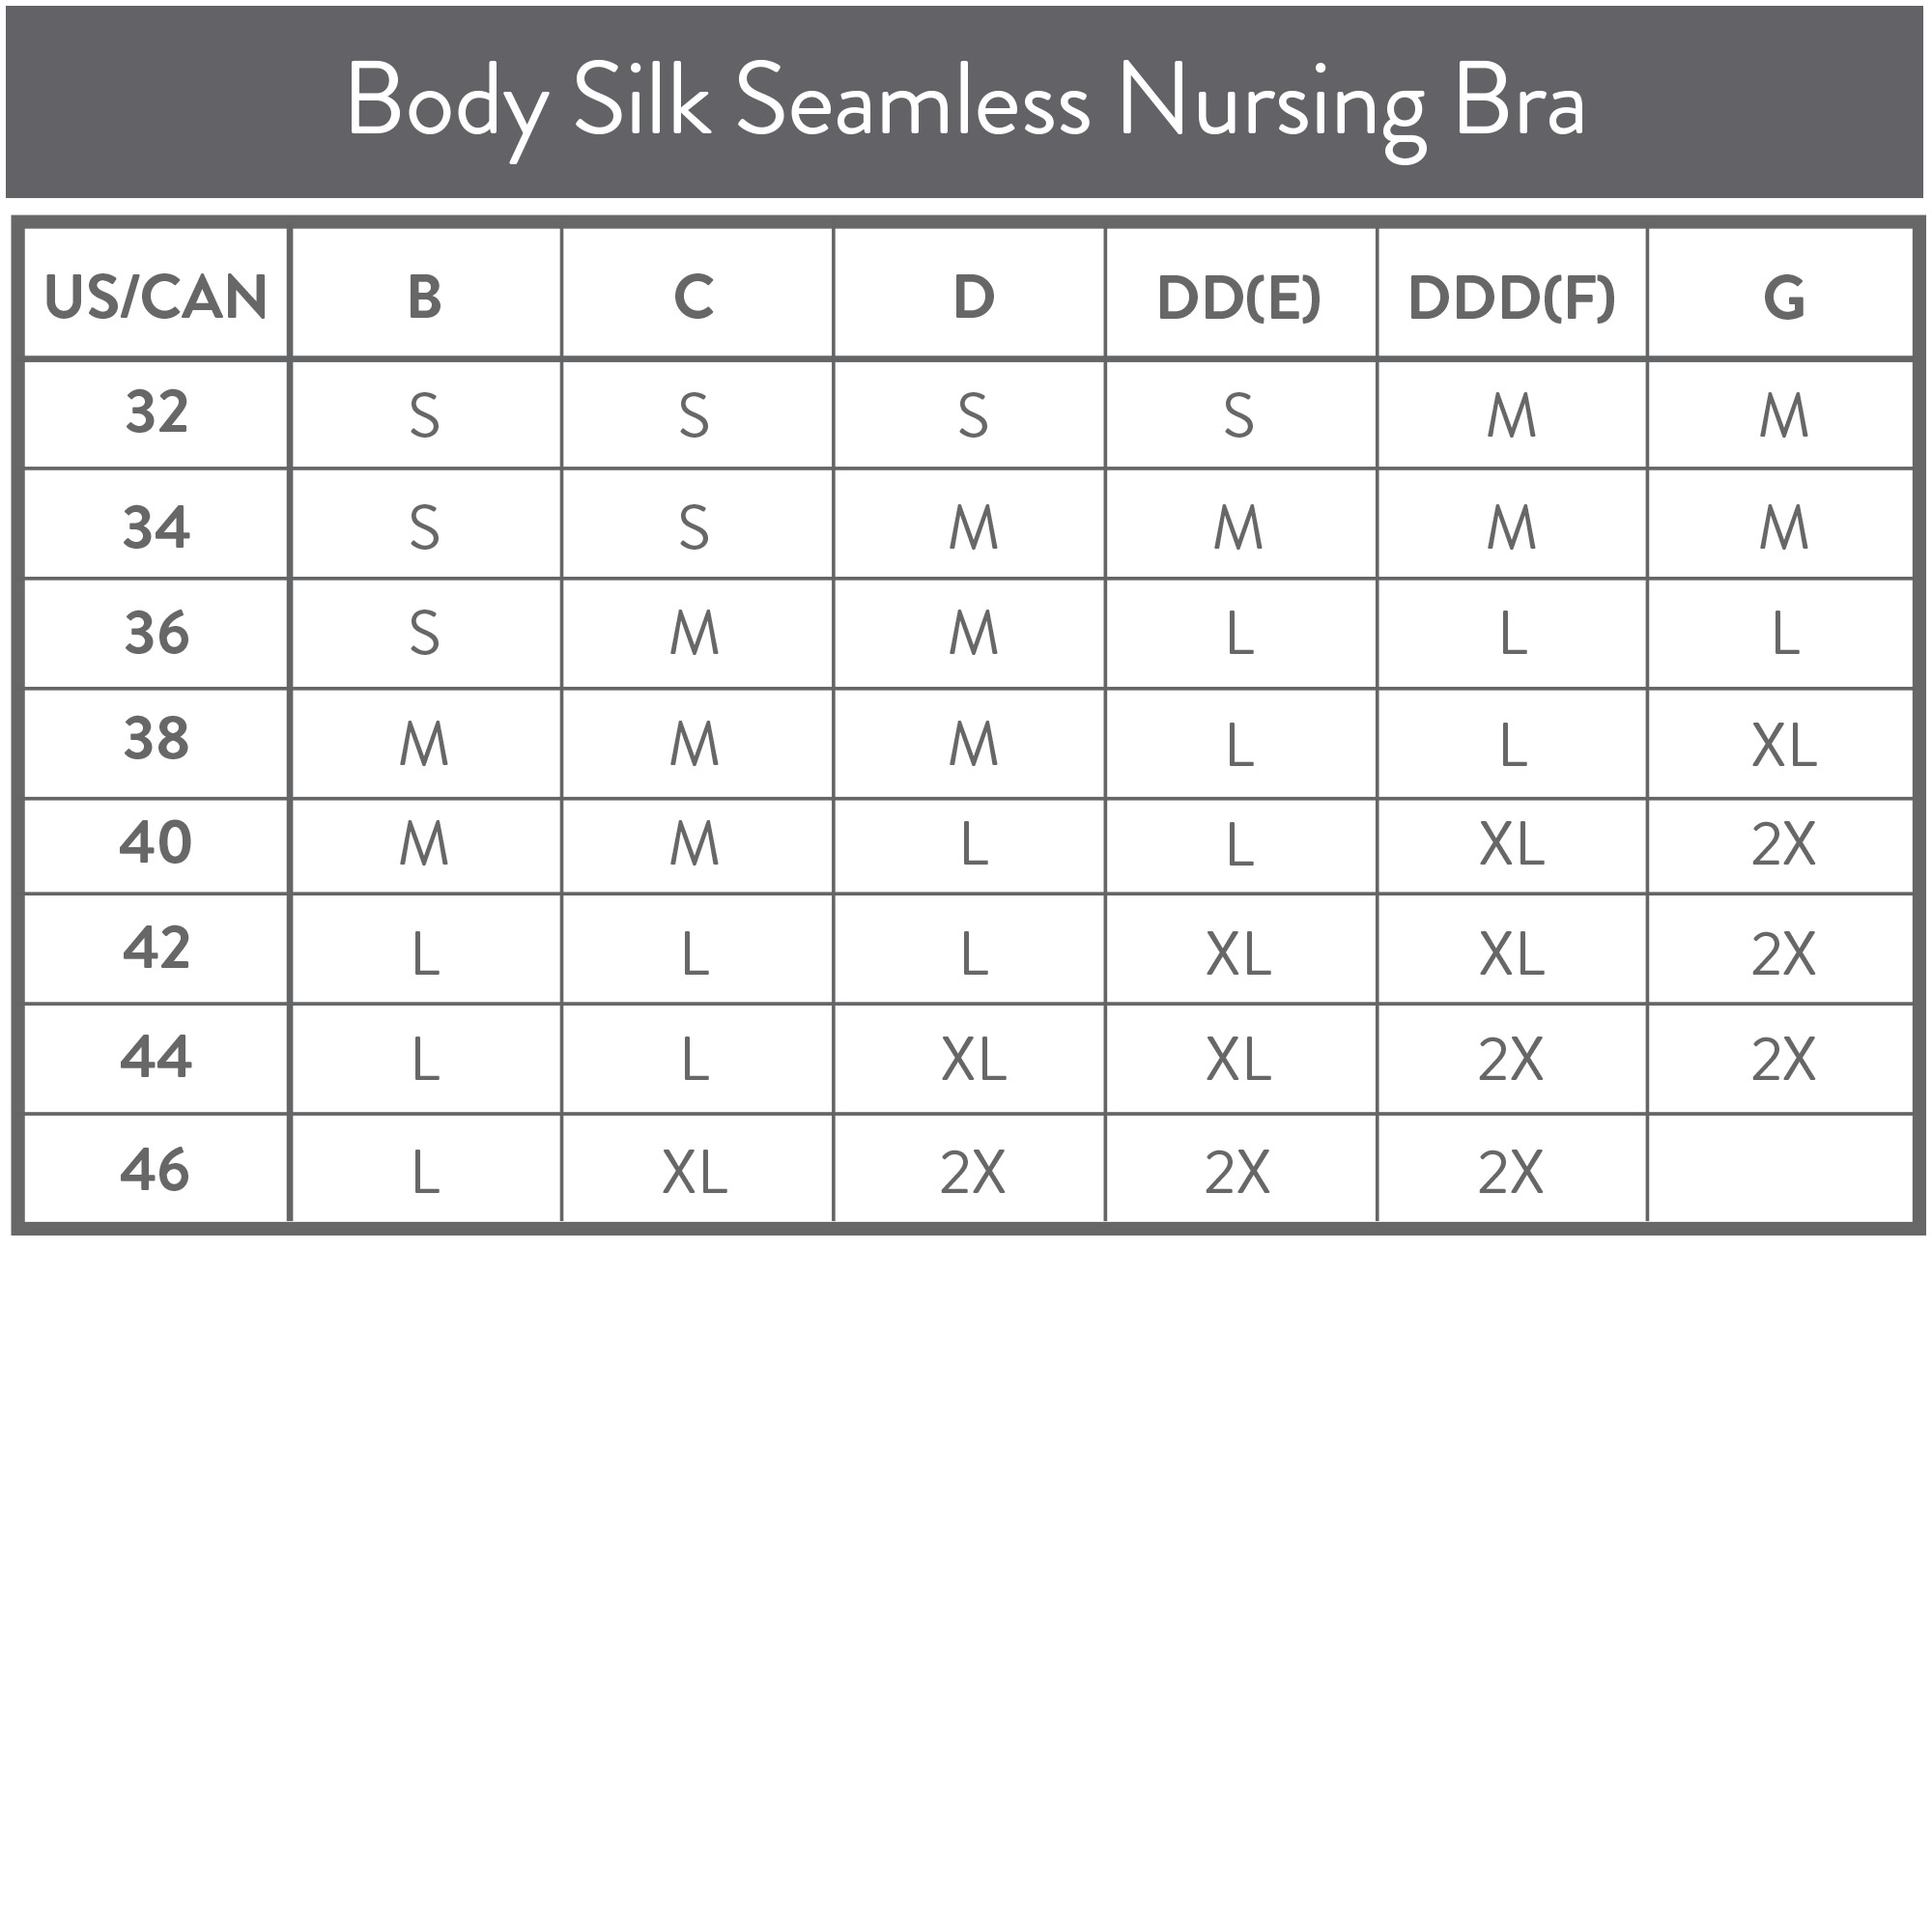 Size-Chart-Body-Silk-Seamless-Nursing-Bra-FALL2016.jpg